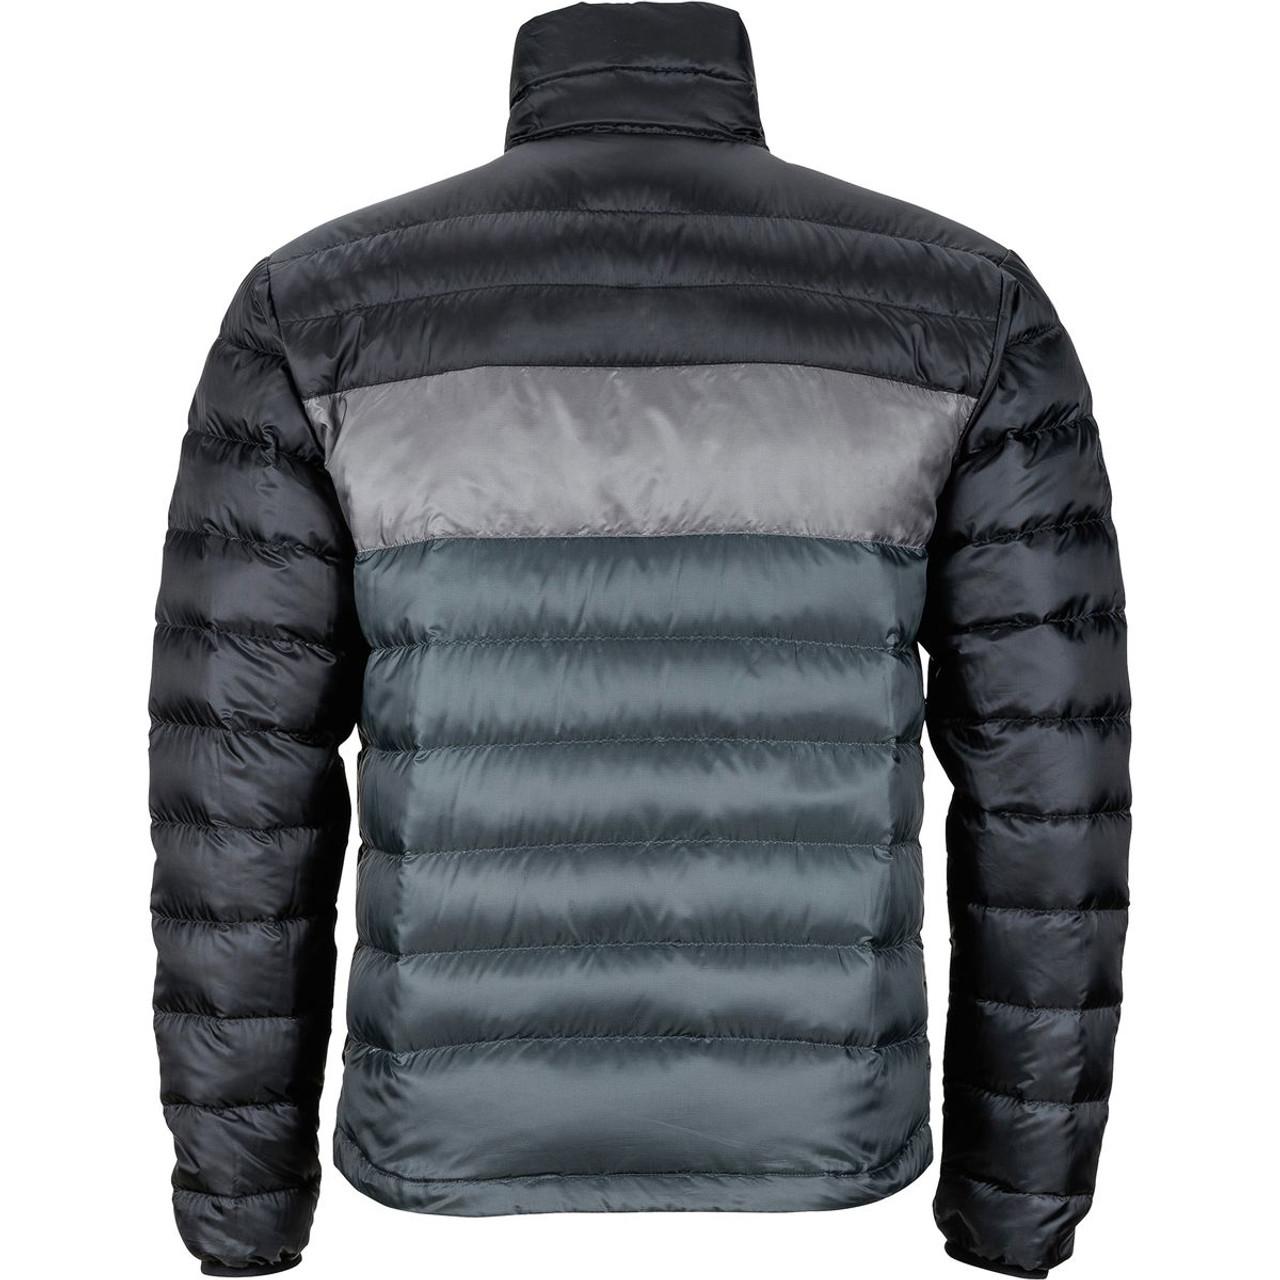 69ab7518b8748 Marmot Ares Jacket Mens Grey Black | Boardparadise.com